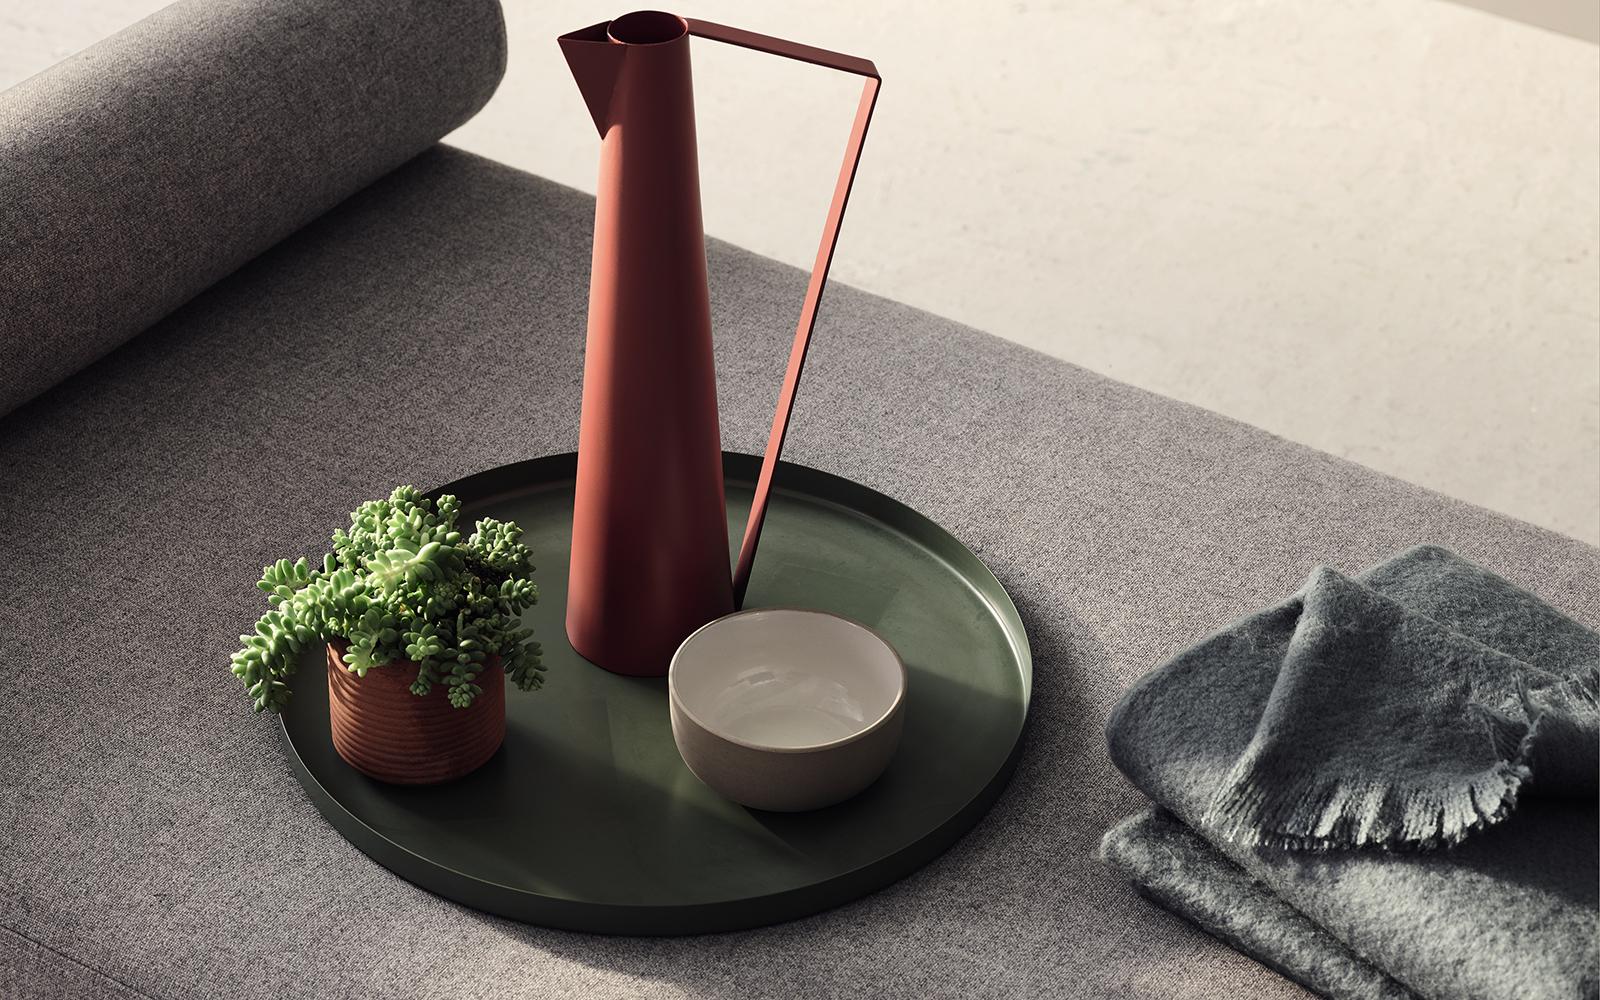 LOEWE Bild3, speakers, tv, interieurdesign via The Art of Living Online